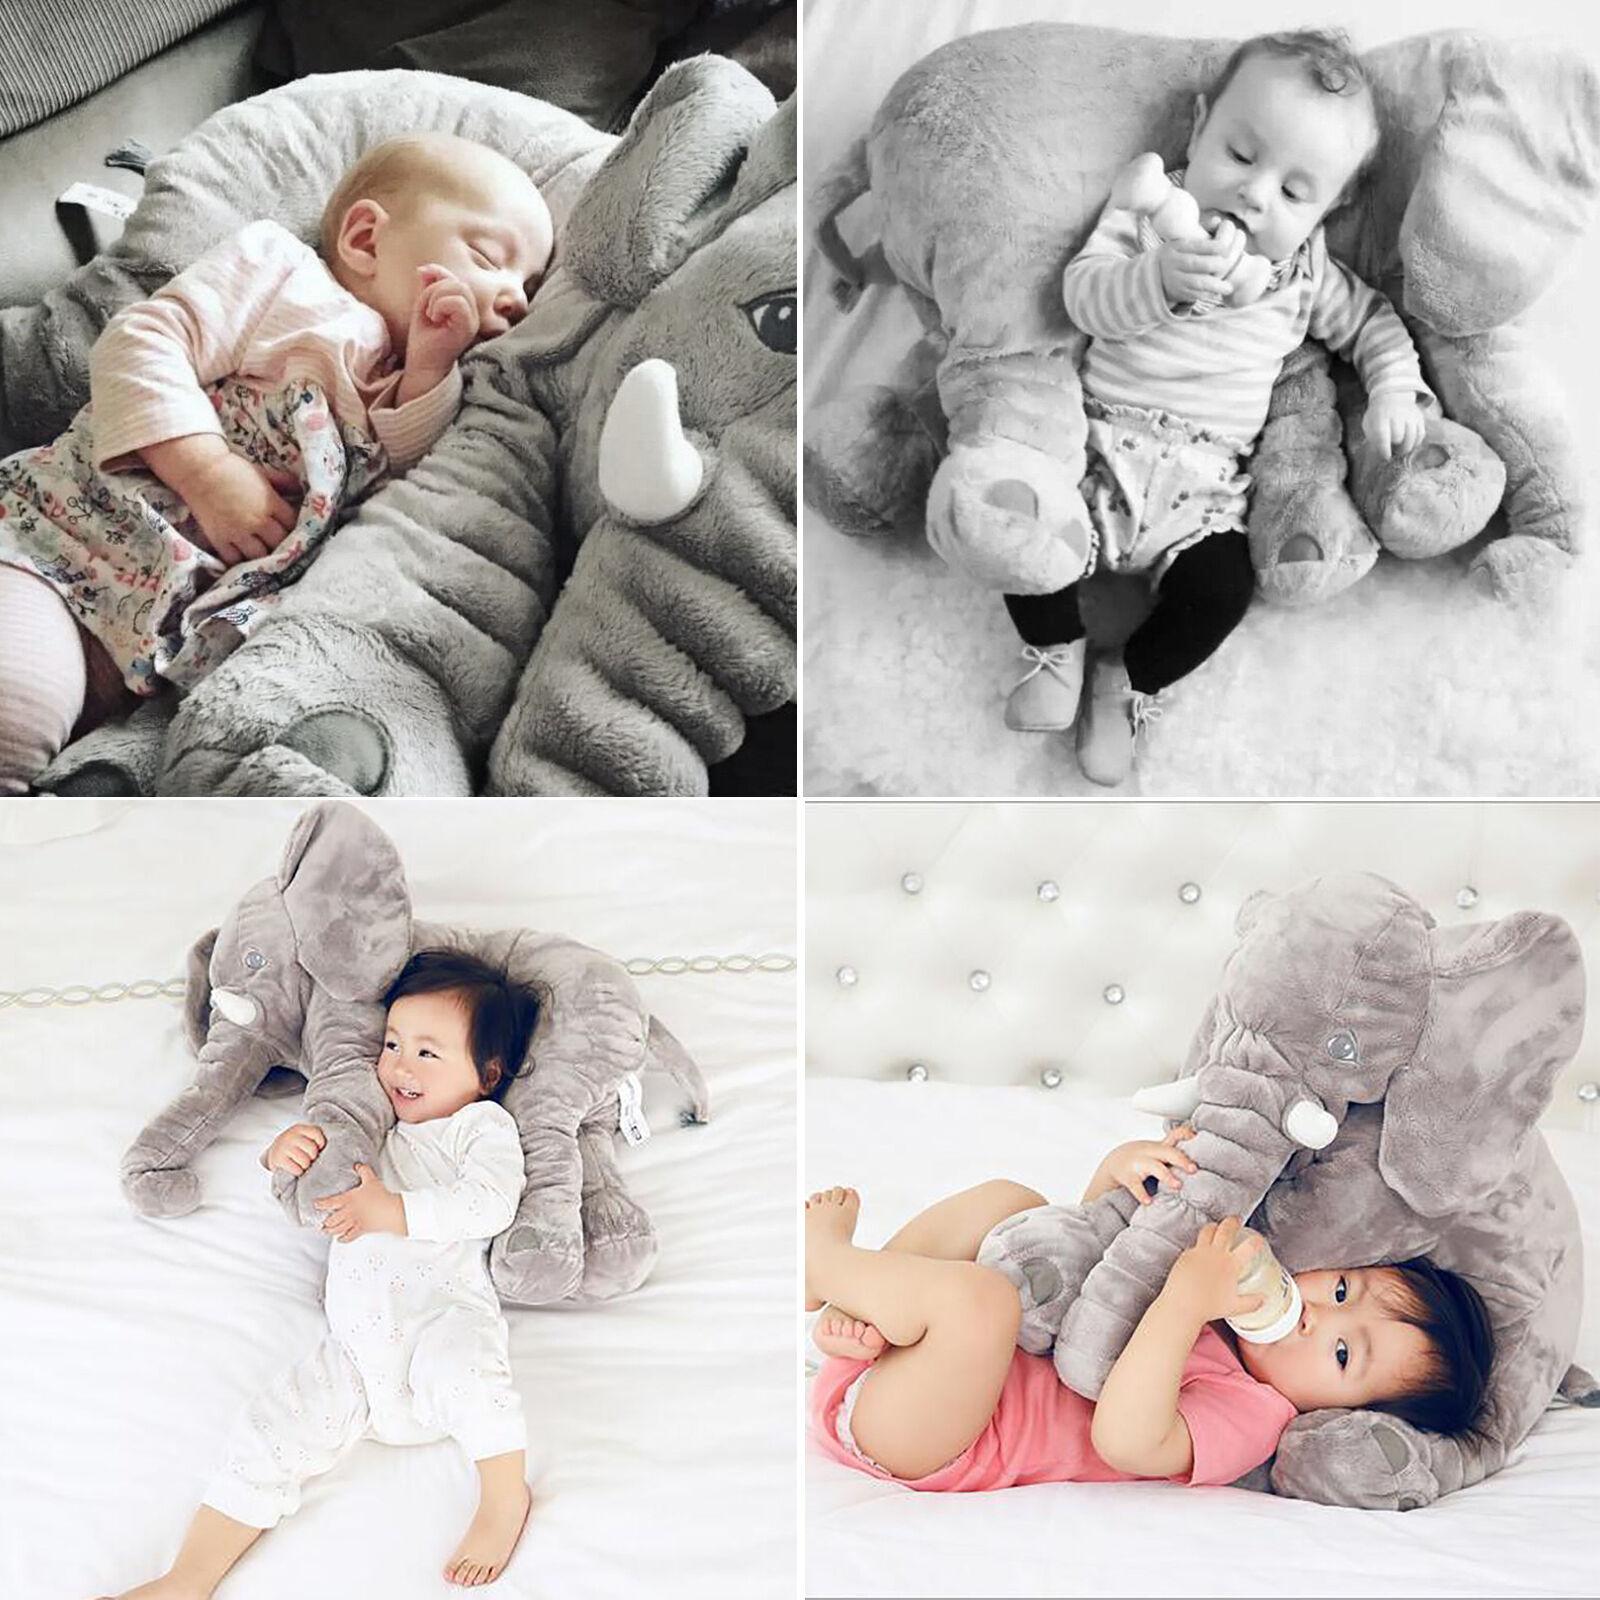 Stuffed Animal Cushion Kids Baby Sleeping Soft Pillow Toy